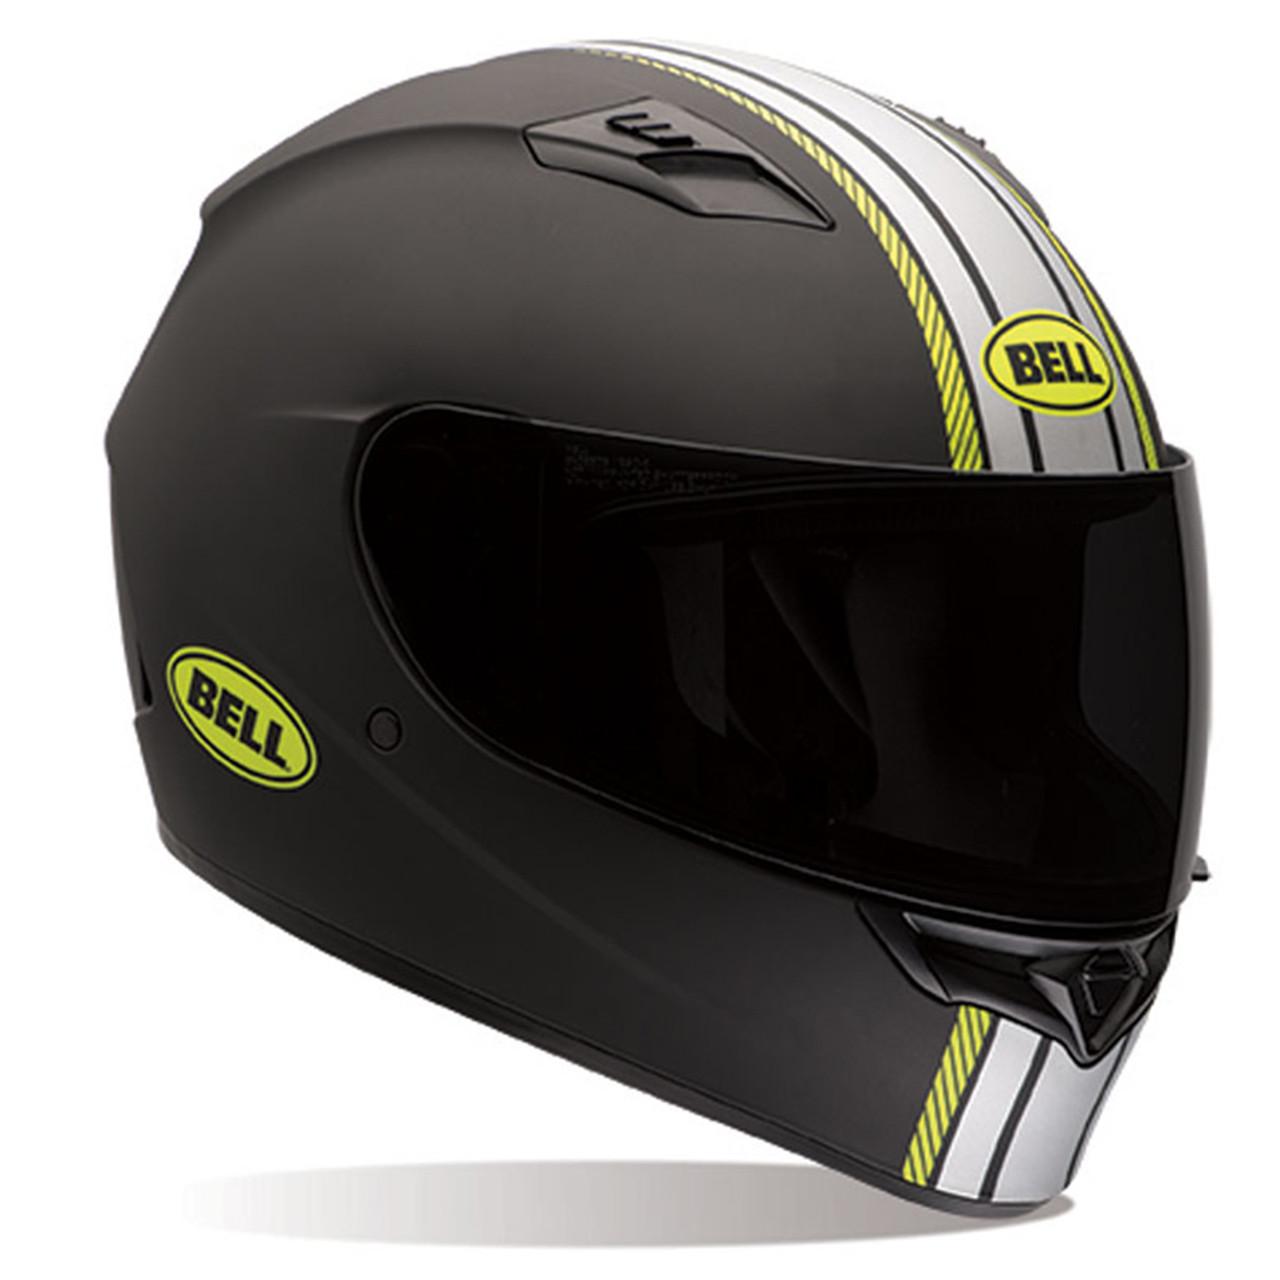 Bell Motorcycle Helmet >> Bell Qualifier Hi Vis Rally Matte Helmet